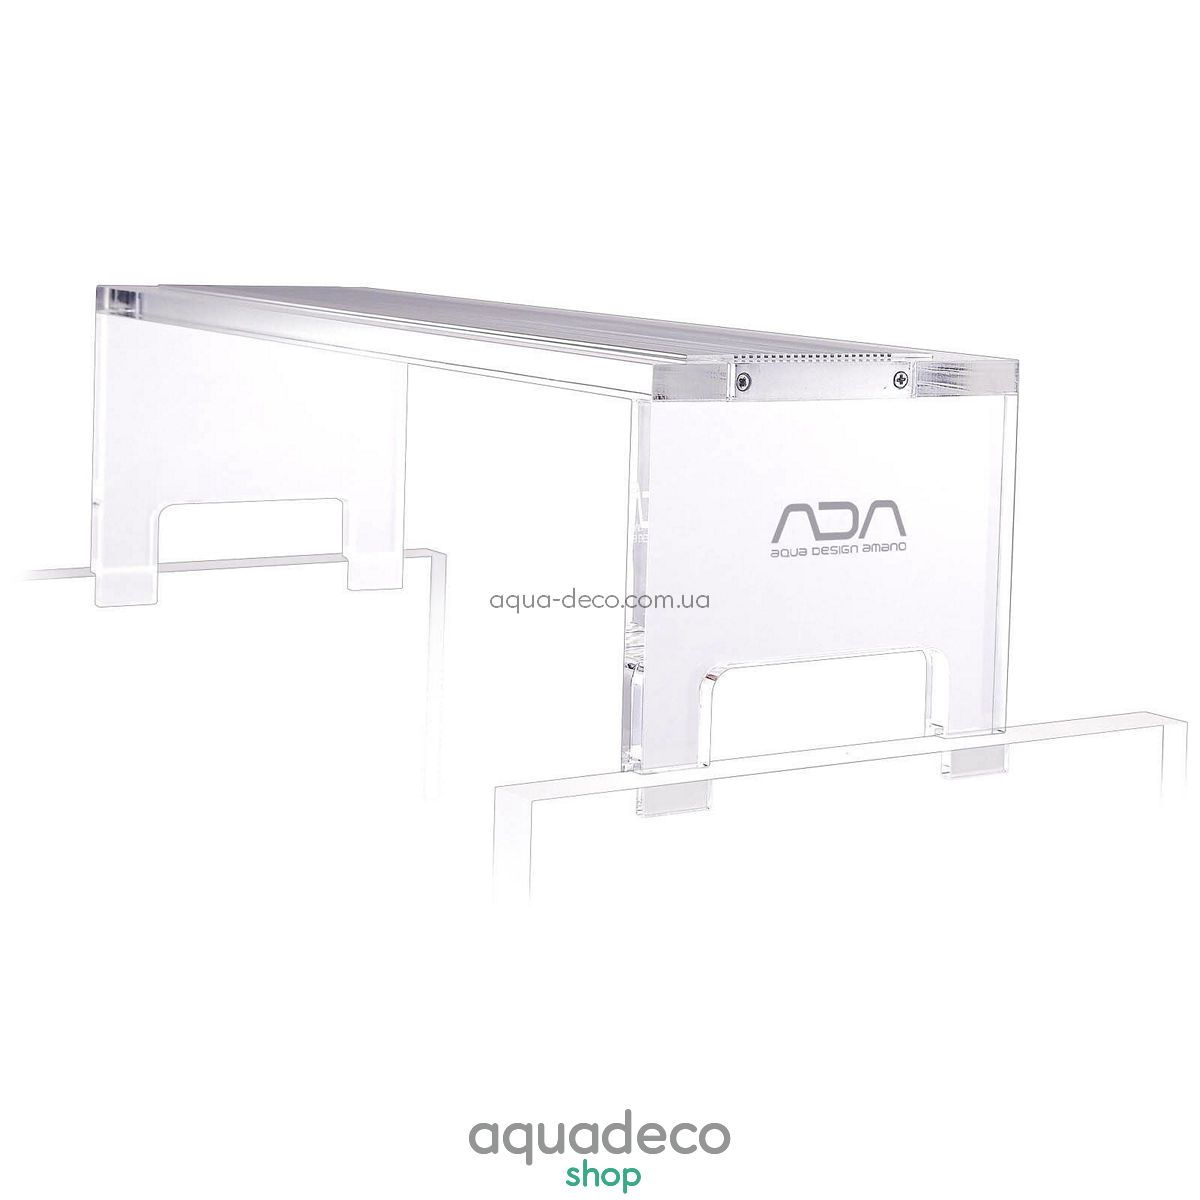 ADA AQUASKY 301 LED светильники для аквариума 108-068 - aqua-deco.com.ua